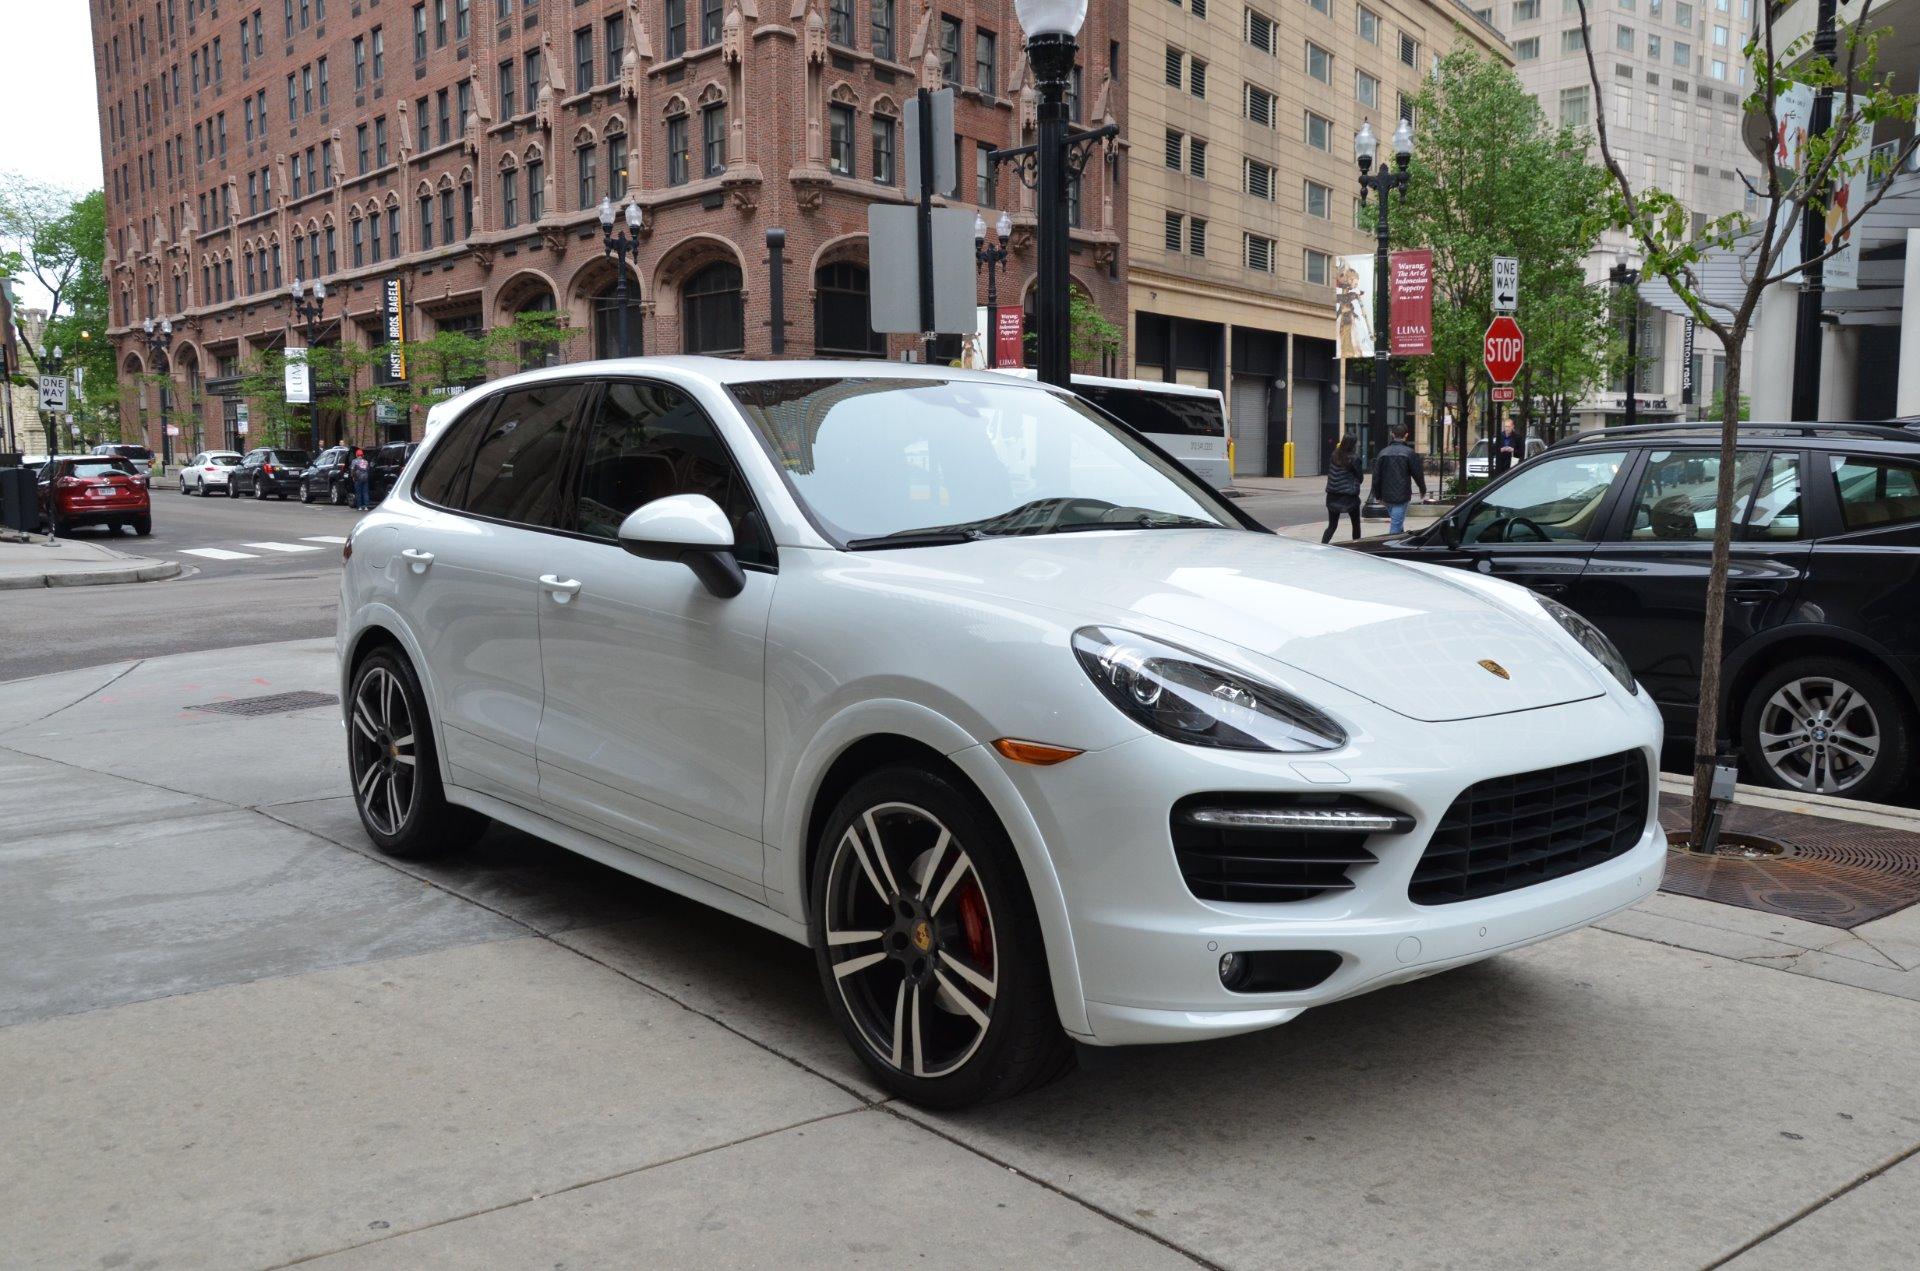 2014 Porsche Cayenne Gts Stock B909b For Sale Near Chicago Il Il Porsche Dealer